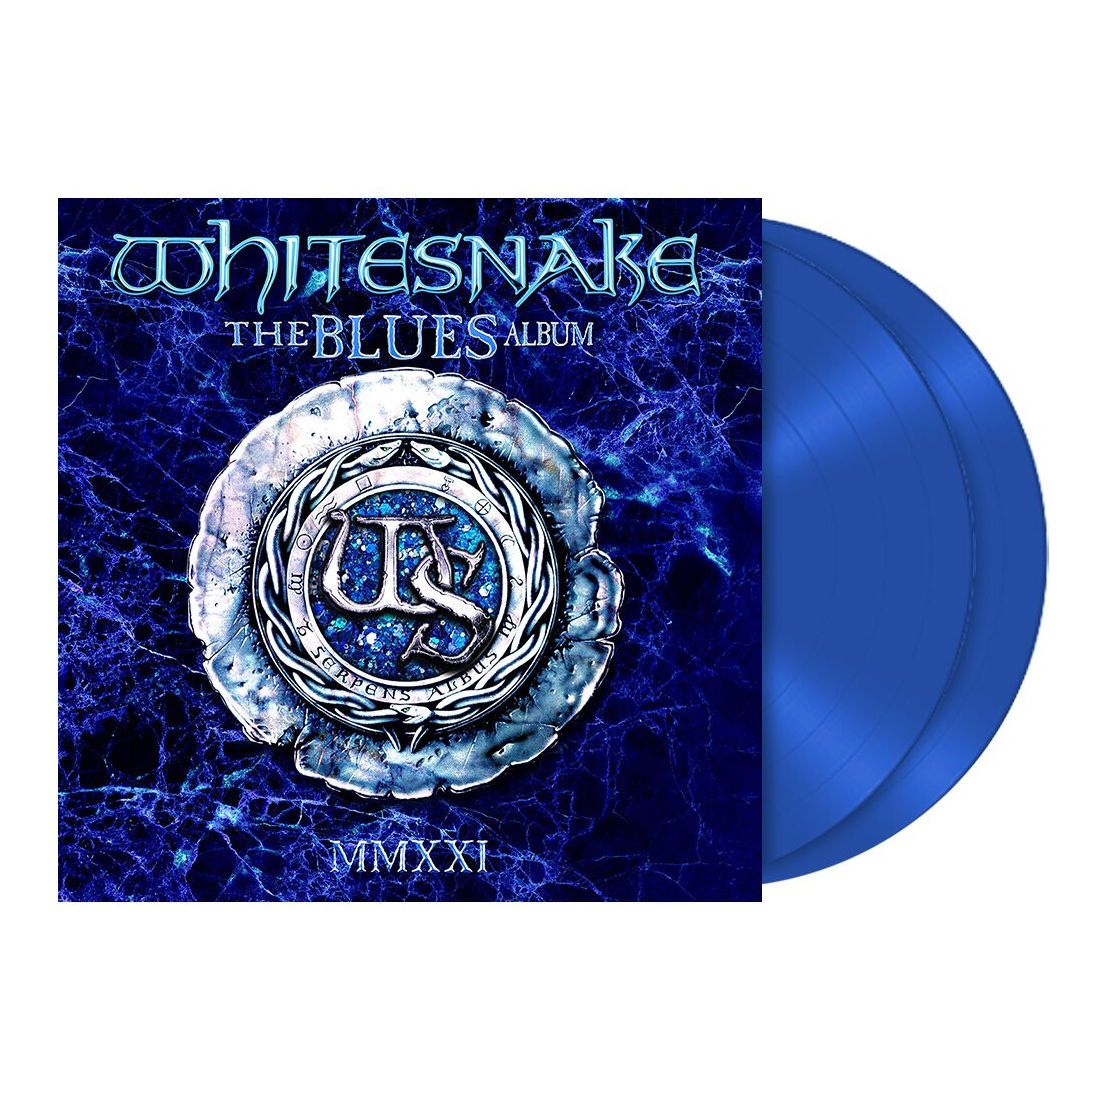 Whitesnake - The Blues Album Limited Edition 2LP Blue Vinyl